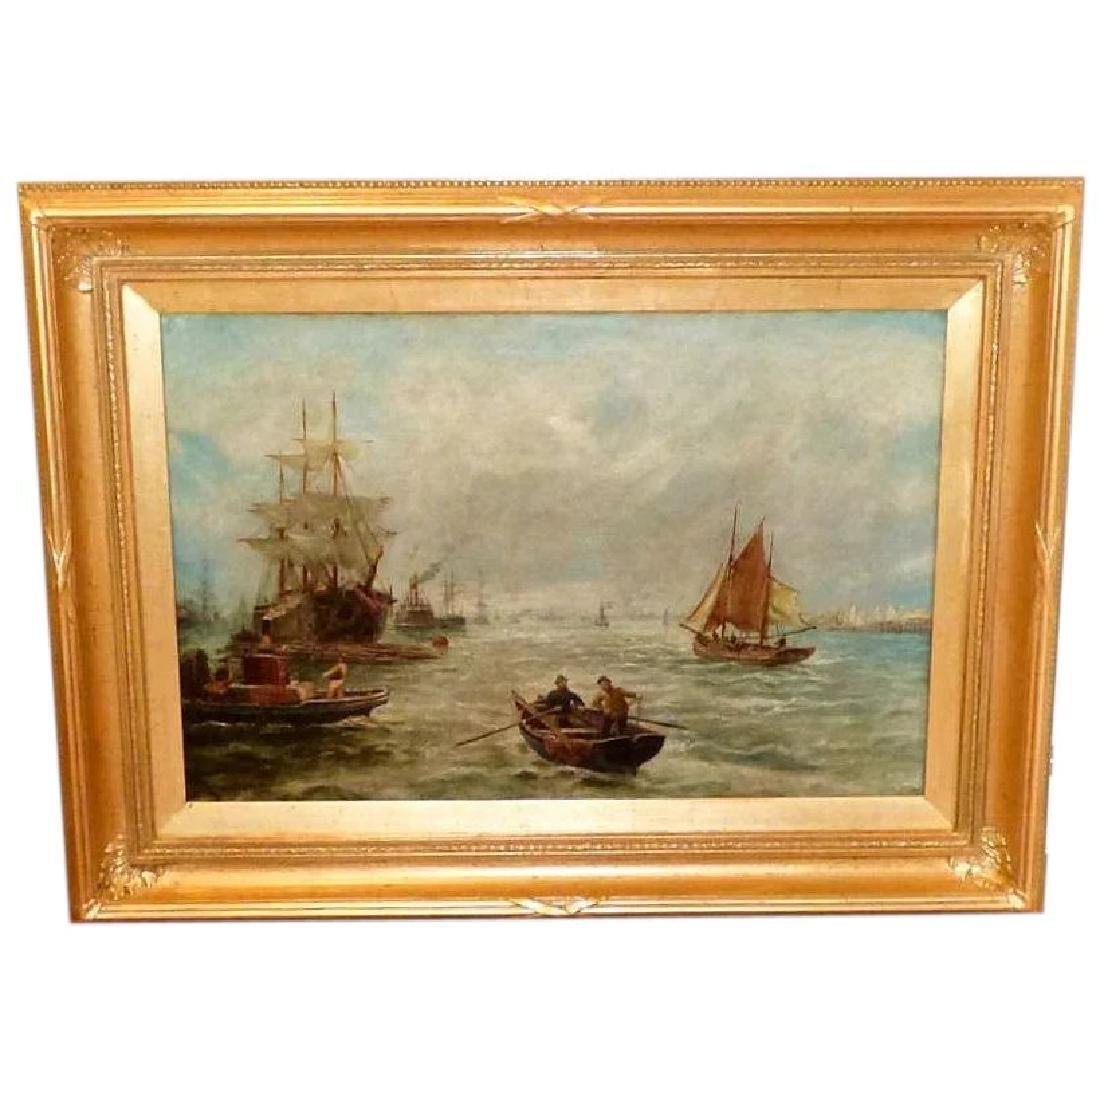 Antique Shipping Scene on the Tyne River, by Bernard B.